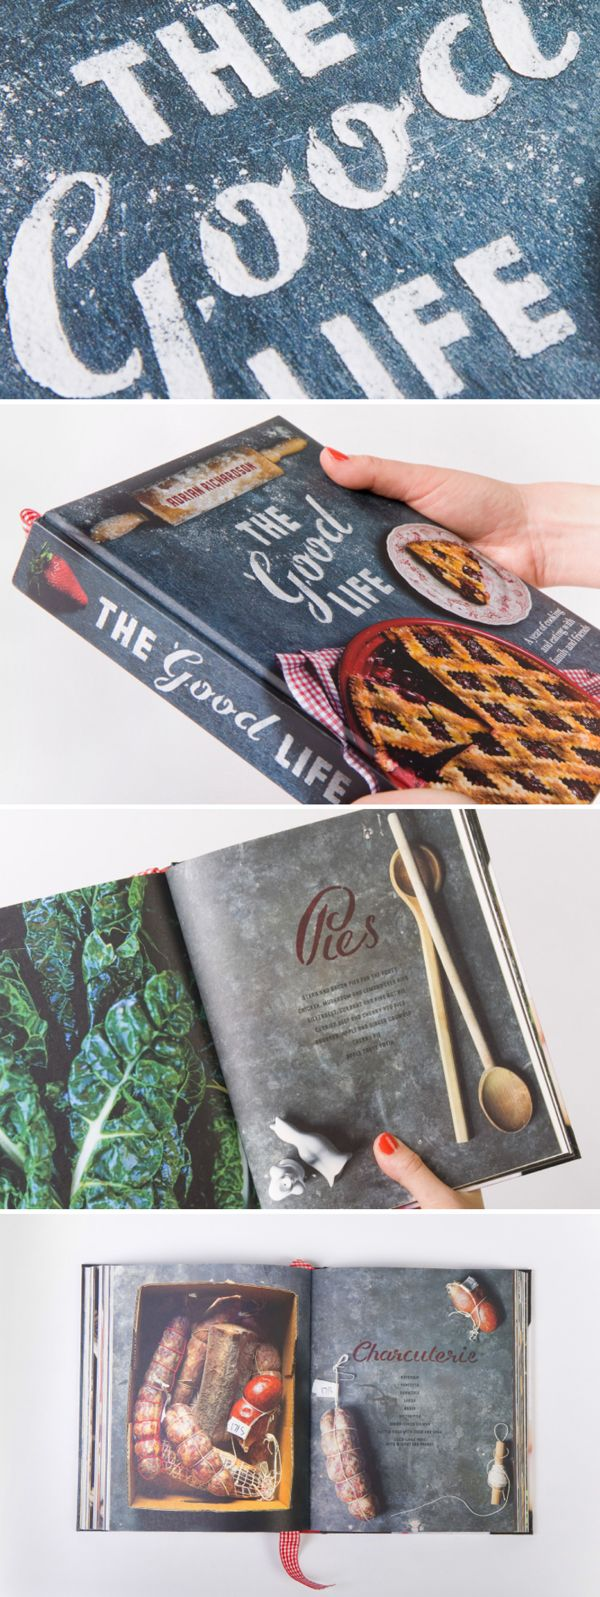 One of my favorite cookbooks.